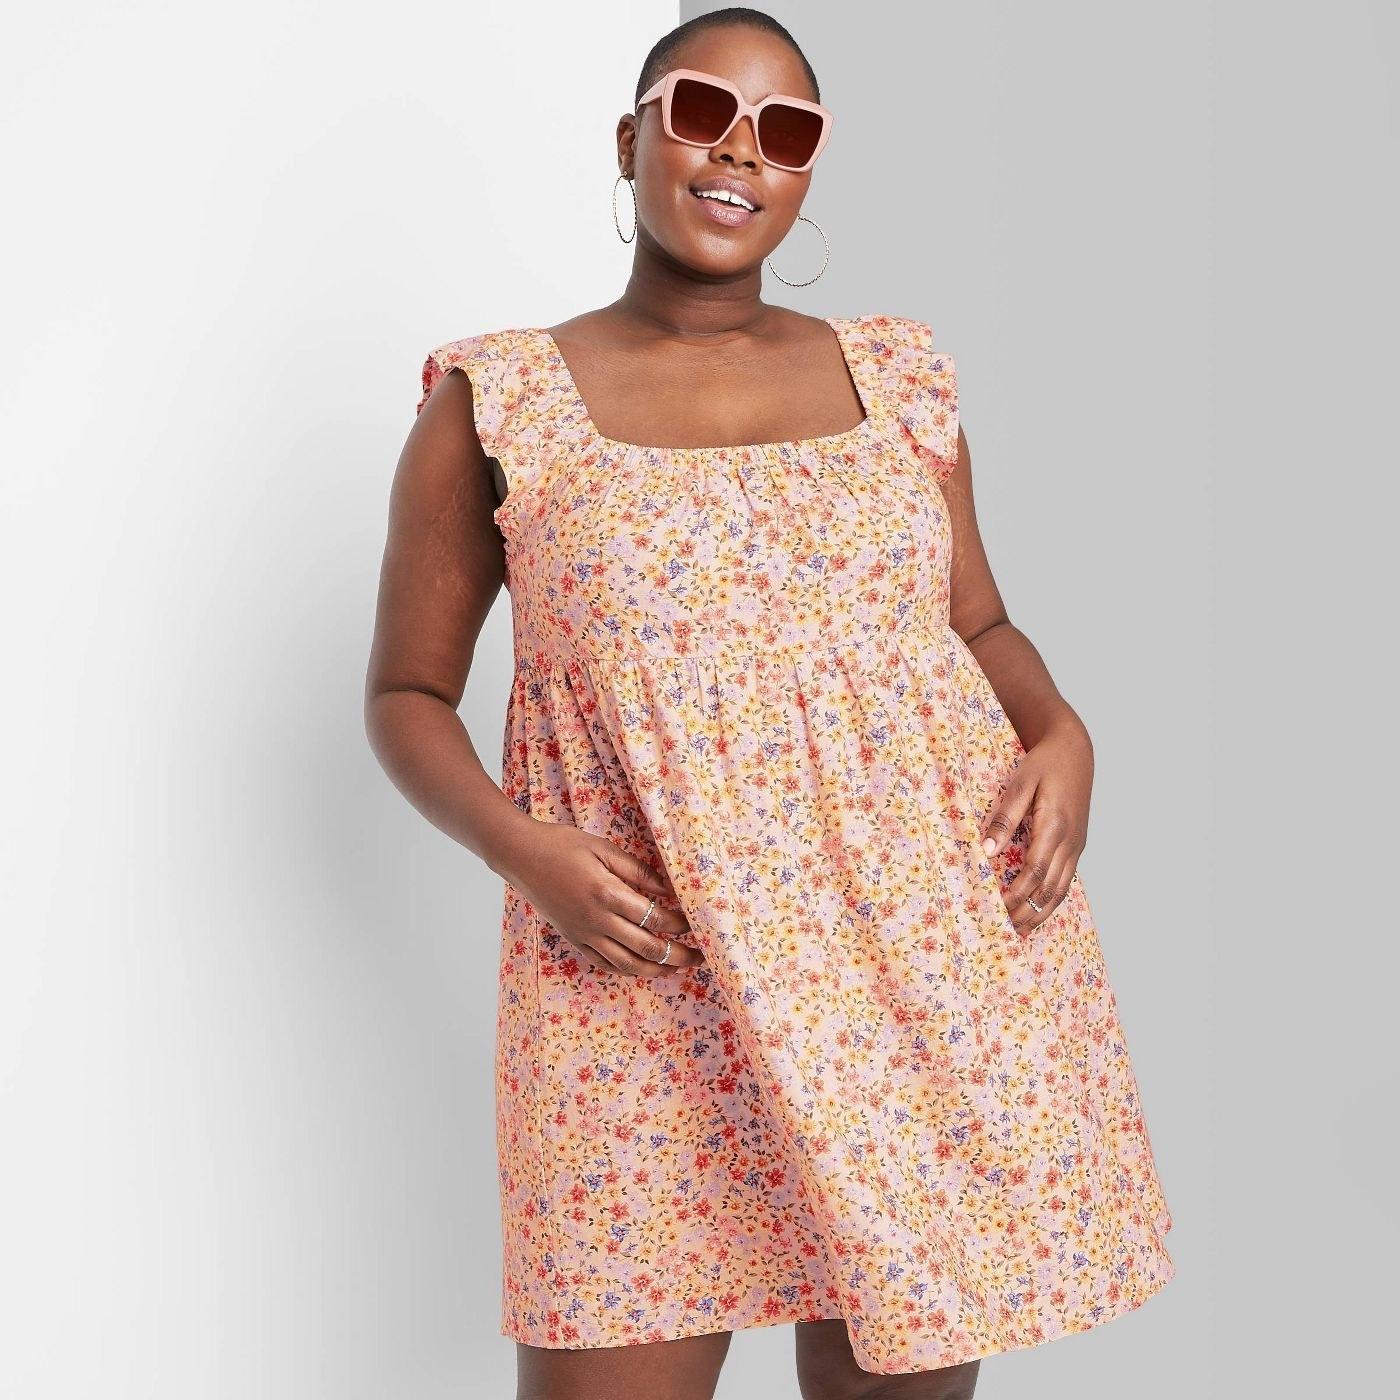 Model wearing orange mini dress with floral print